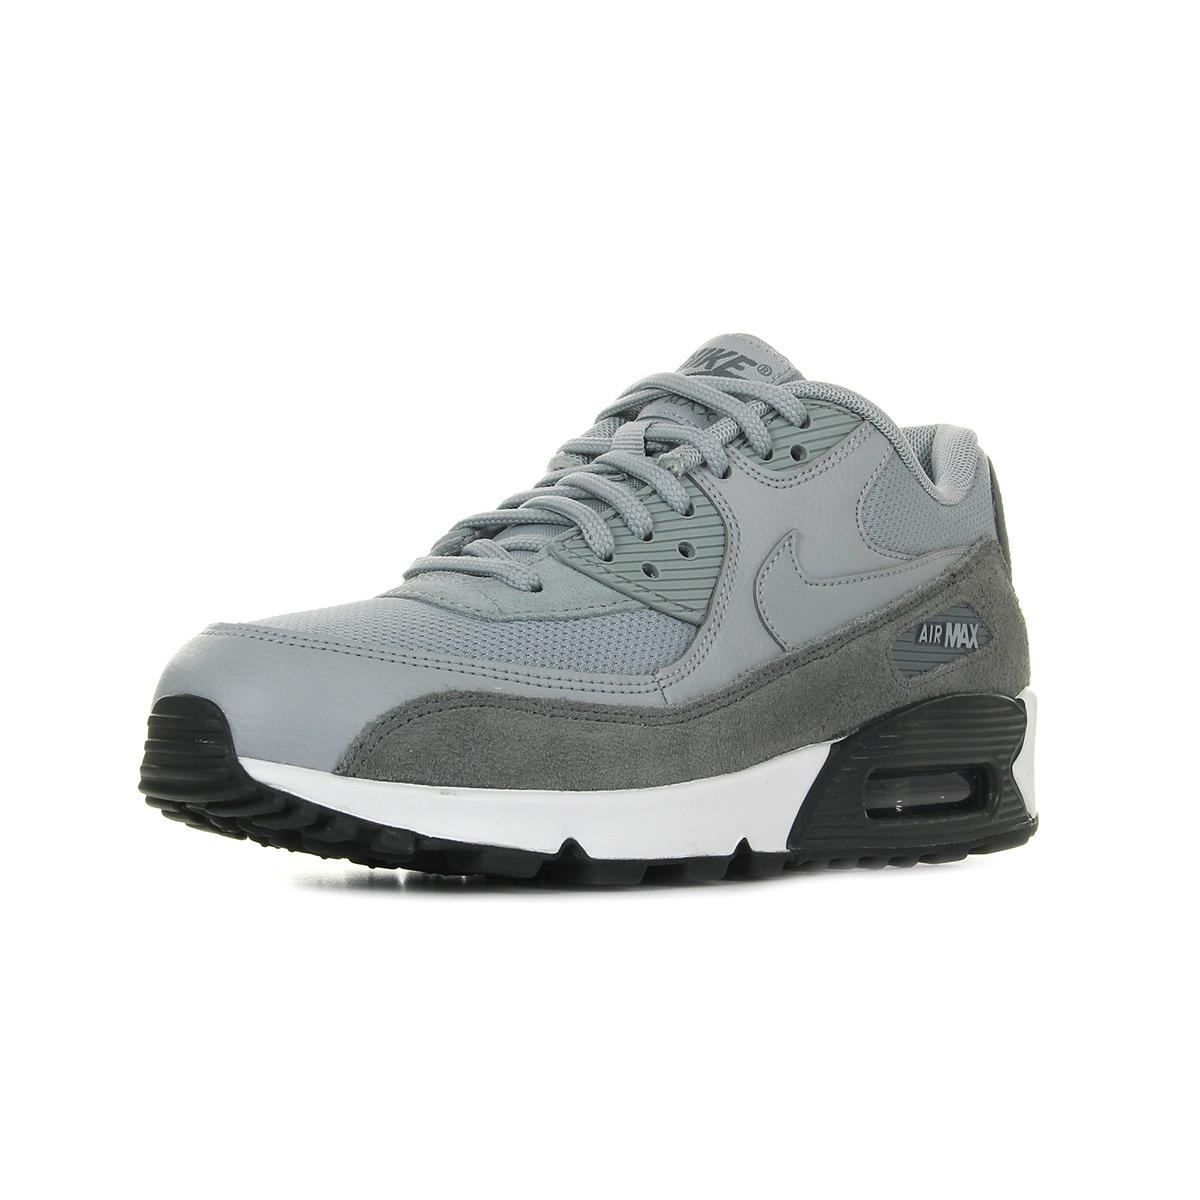 Chaussures Baskets Nike Unisexe Air Max Cuir 90 Taille Gris Grise Cuir Max 154880